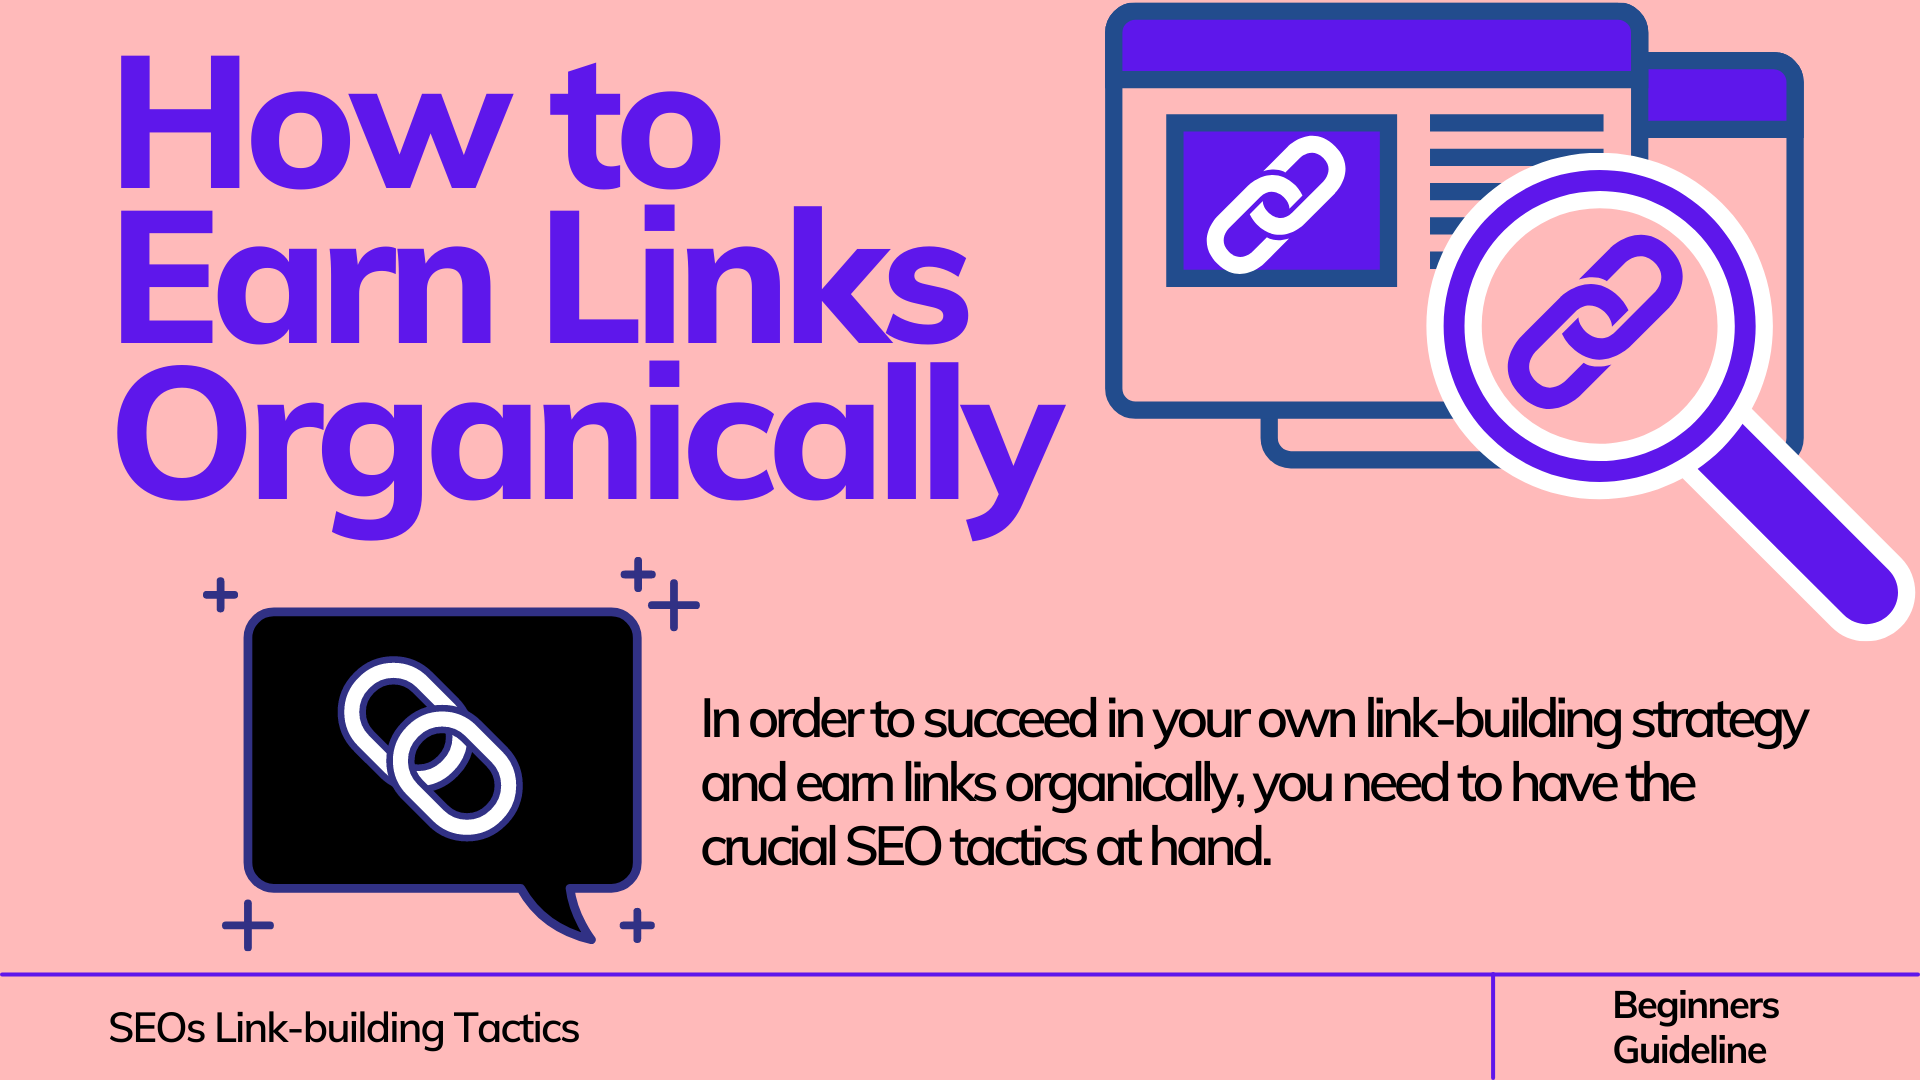 How to Earn Links Organically